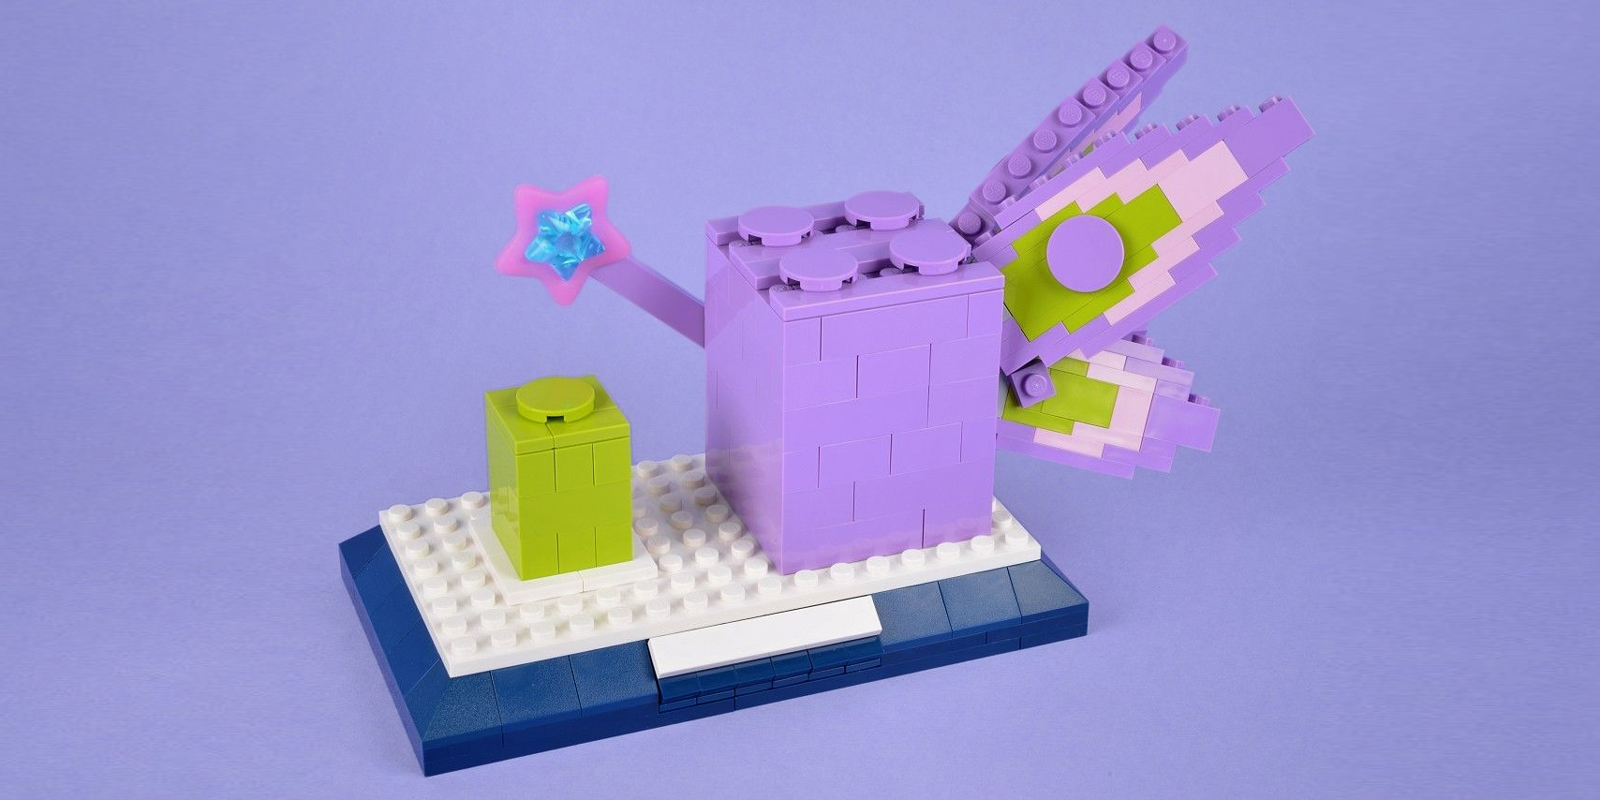 New LEGO Lot of 6 Dark Purple 2x4 Brick Pieces